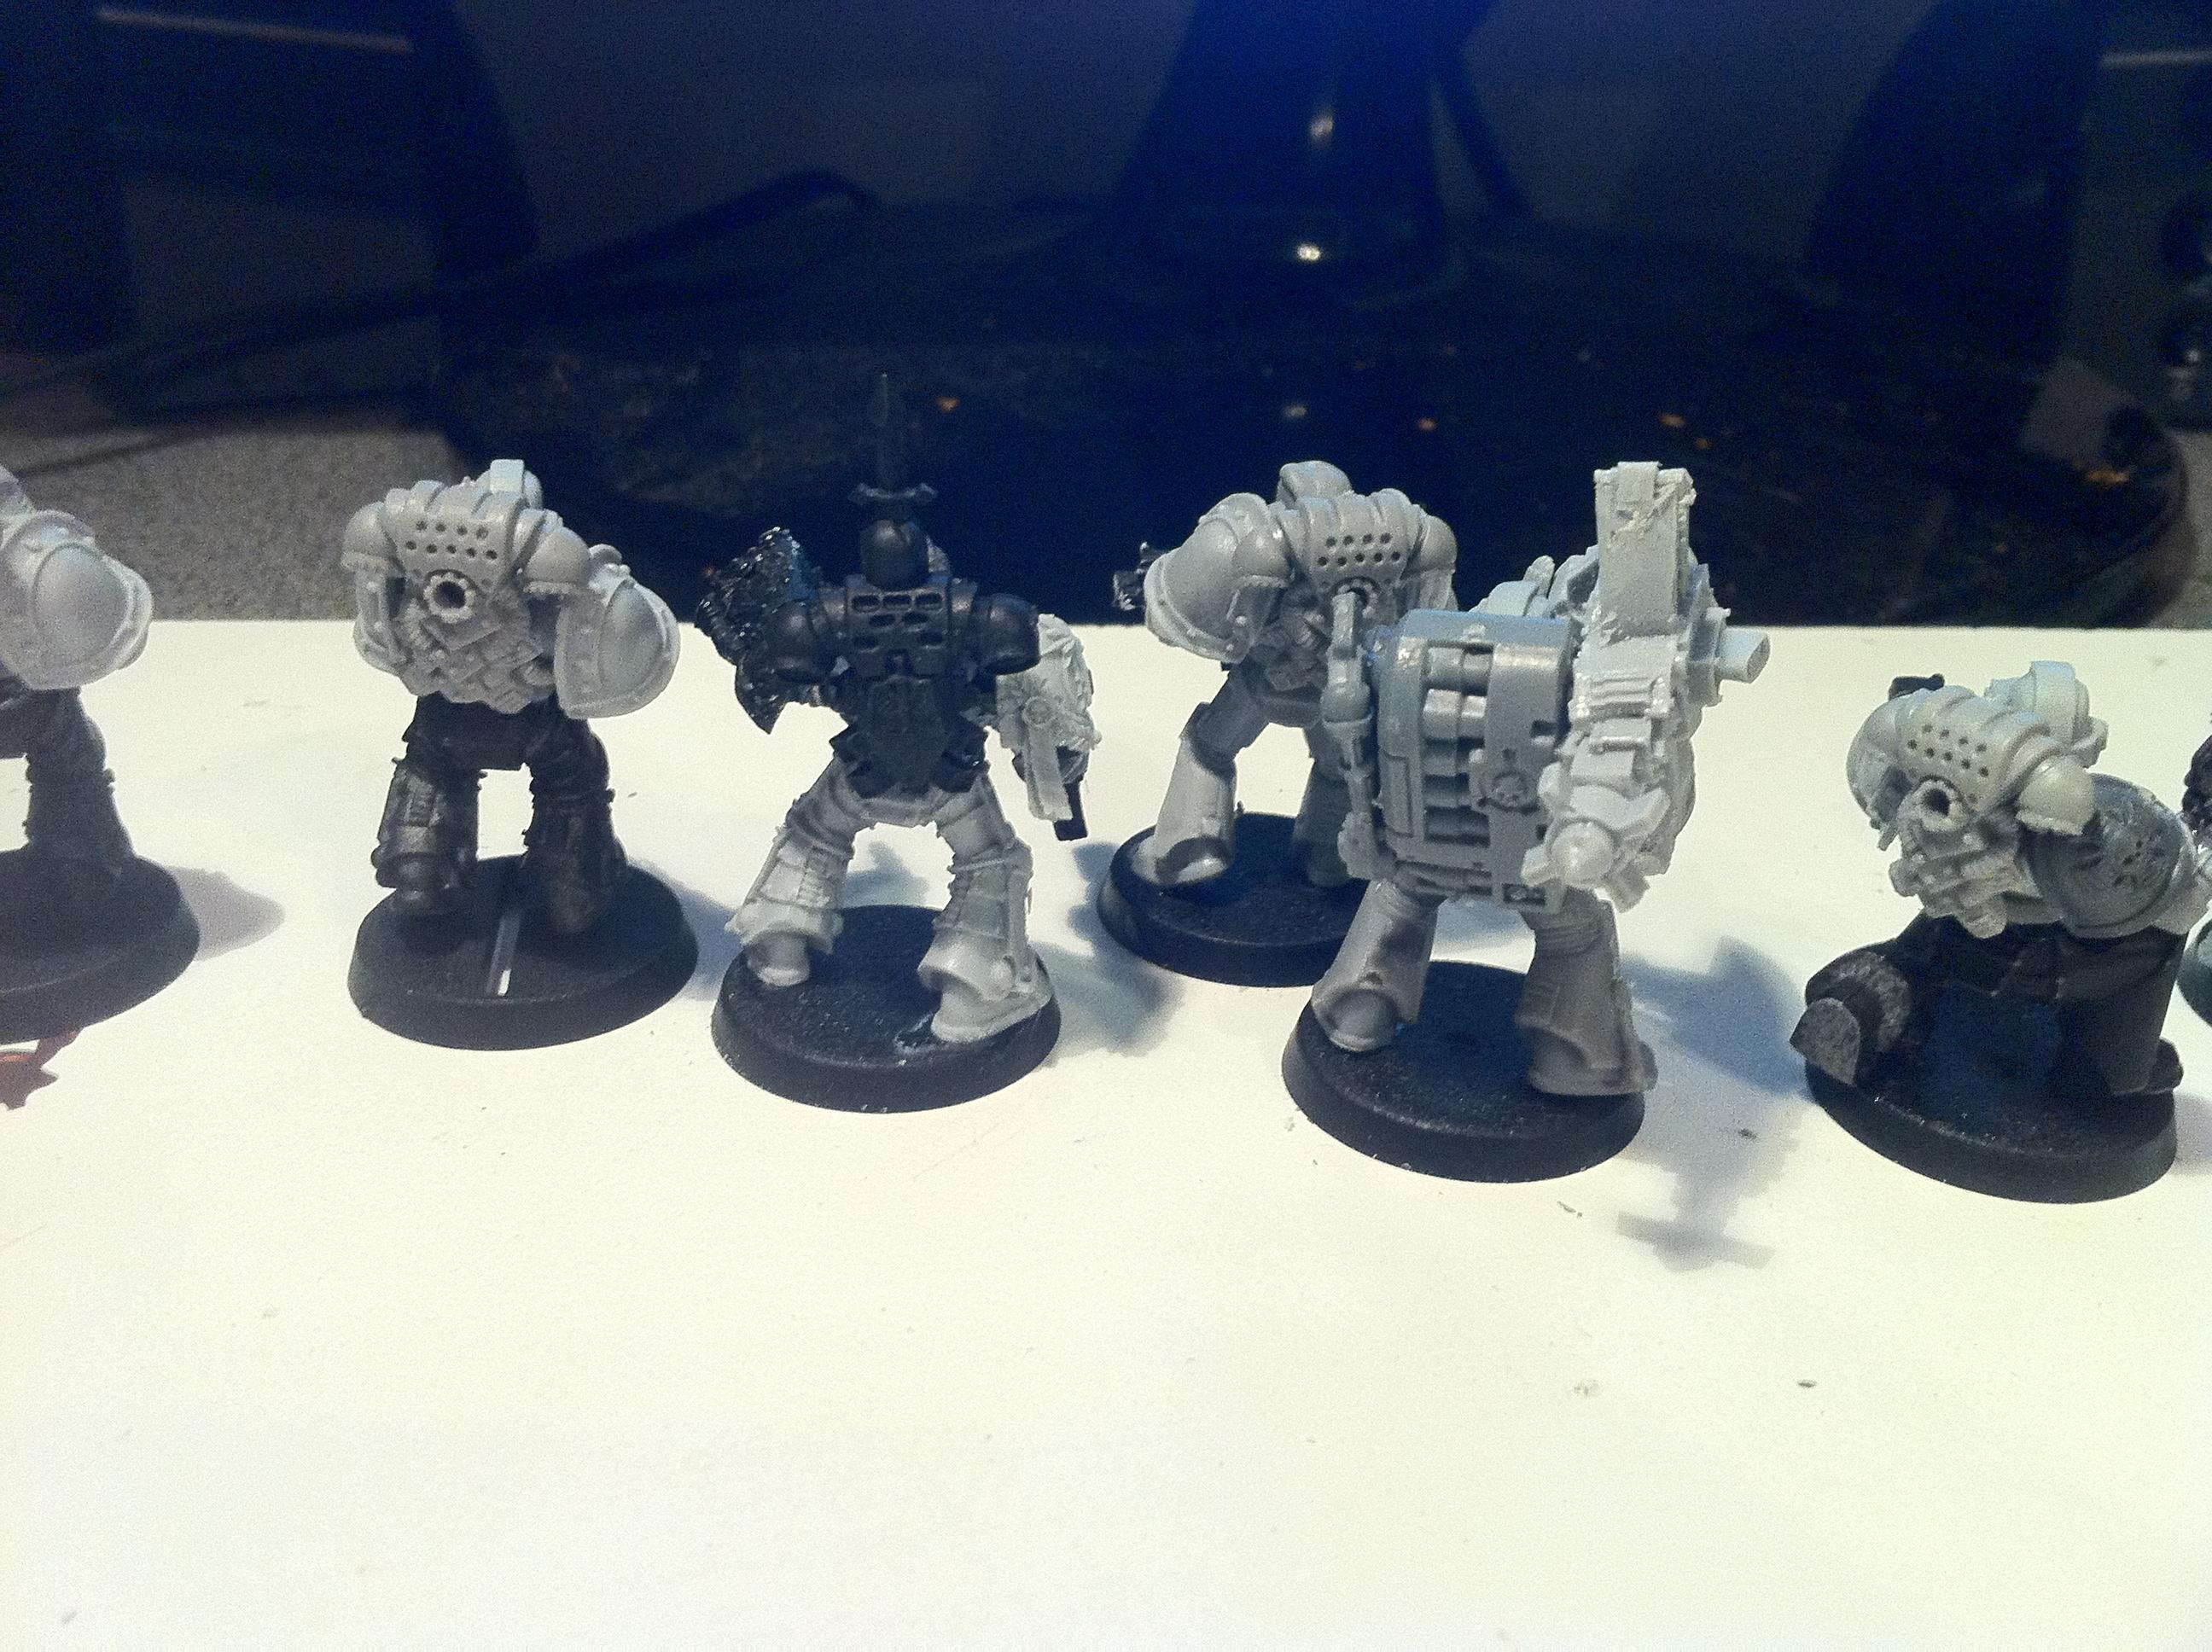 Astral Claws, Badab War, Champion, Corvus, Crusade, Forge World, Iron, Maximus, Sergeant, Tactical Squad